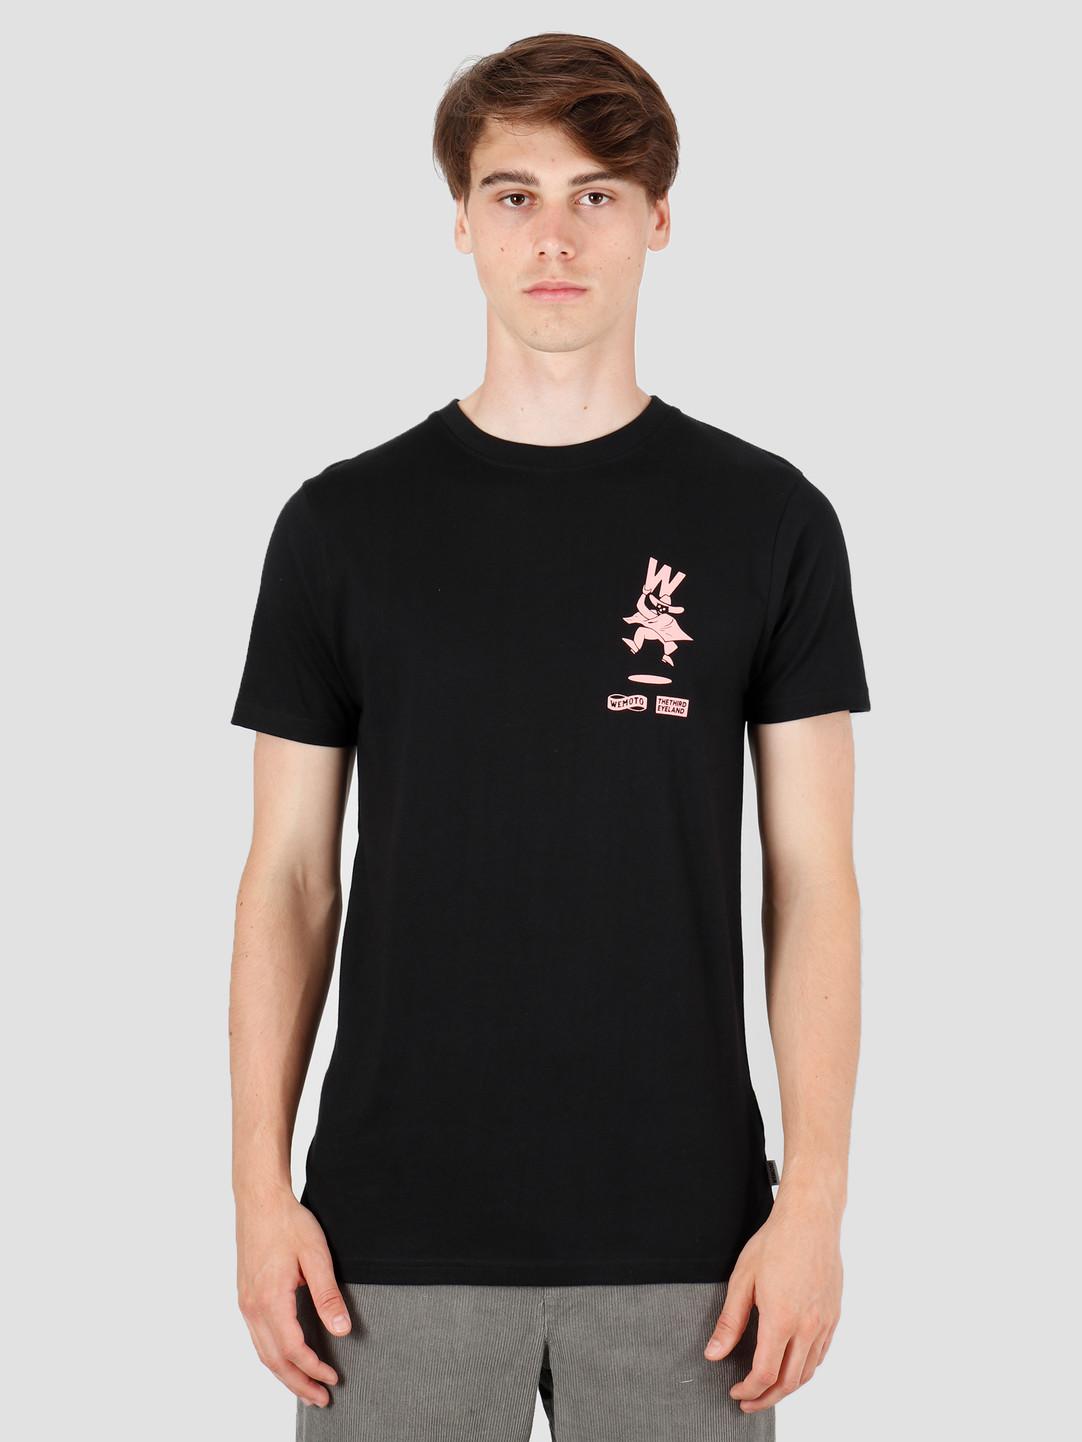 Wemoto Wemoto Wombre T-Shirt Black 141.135-100